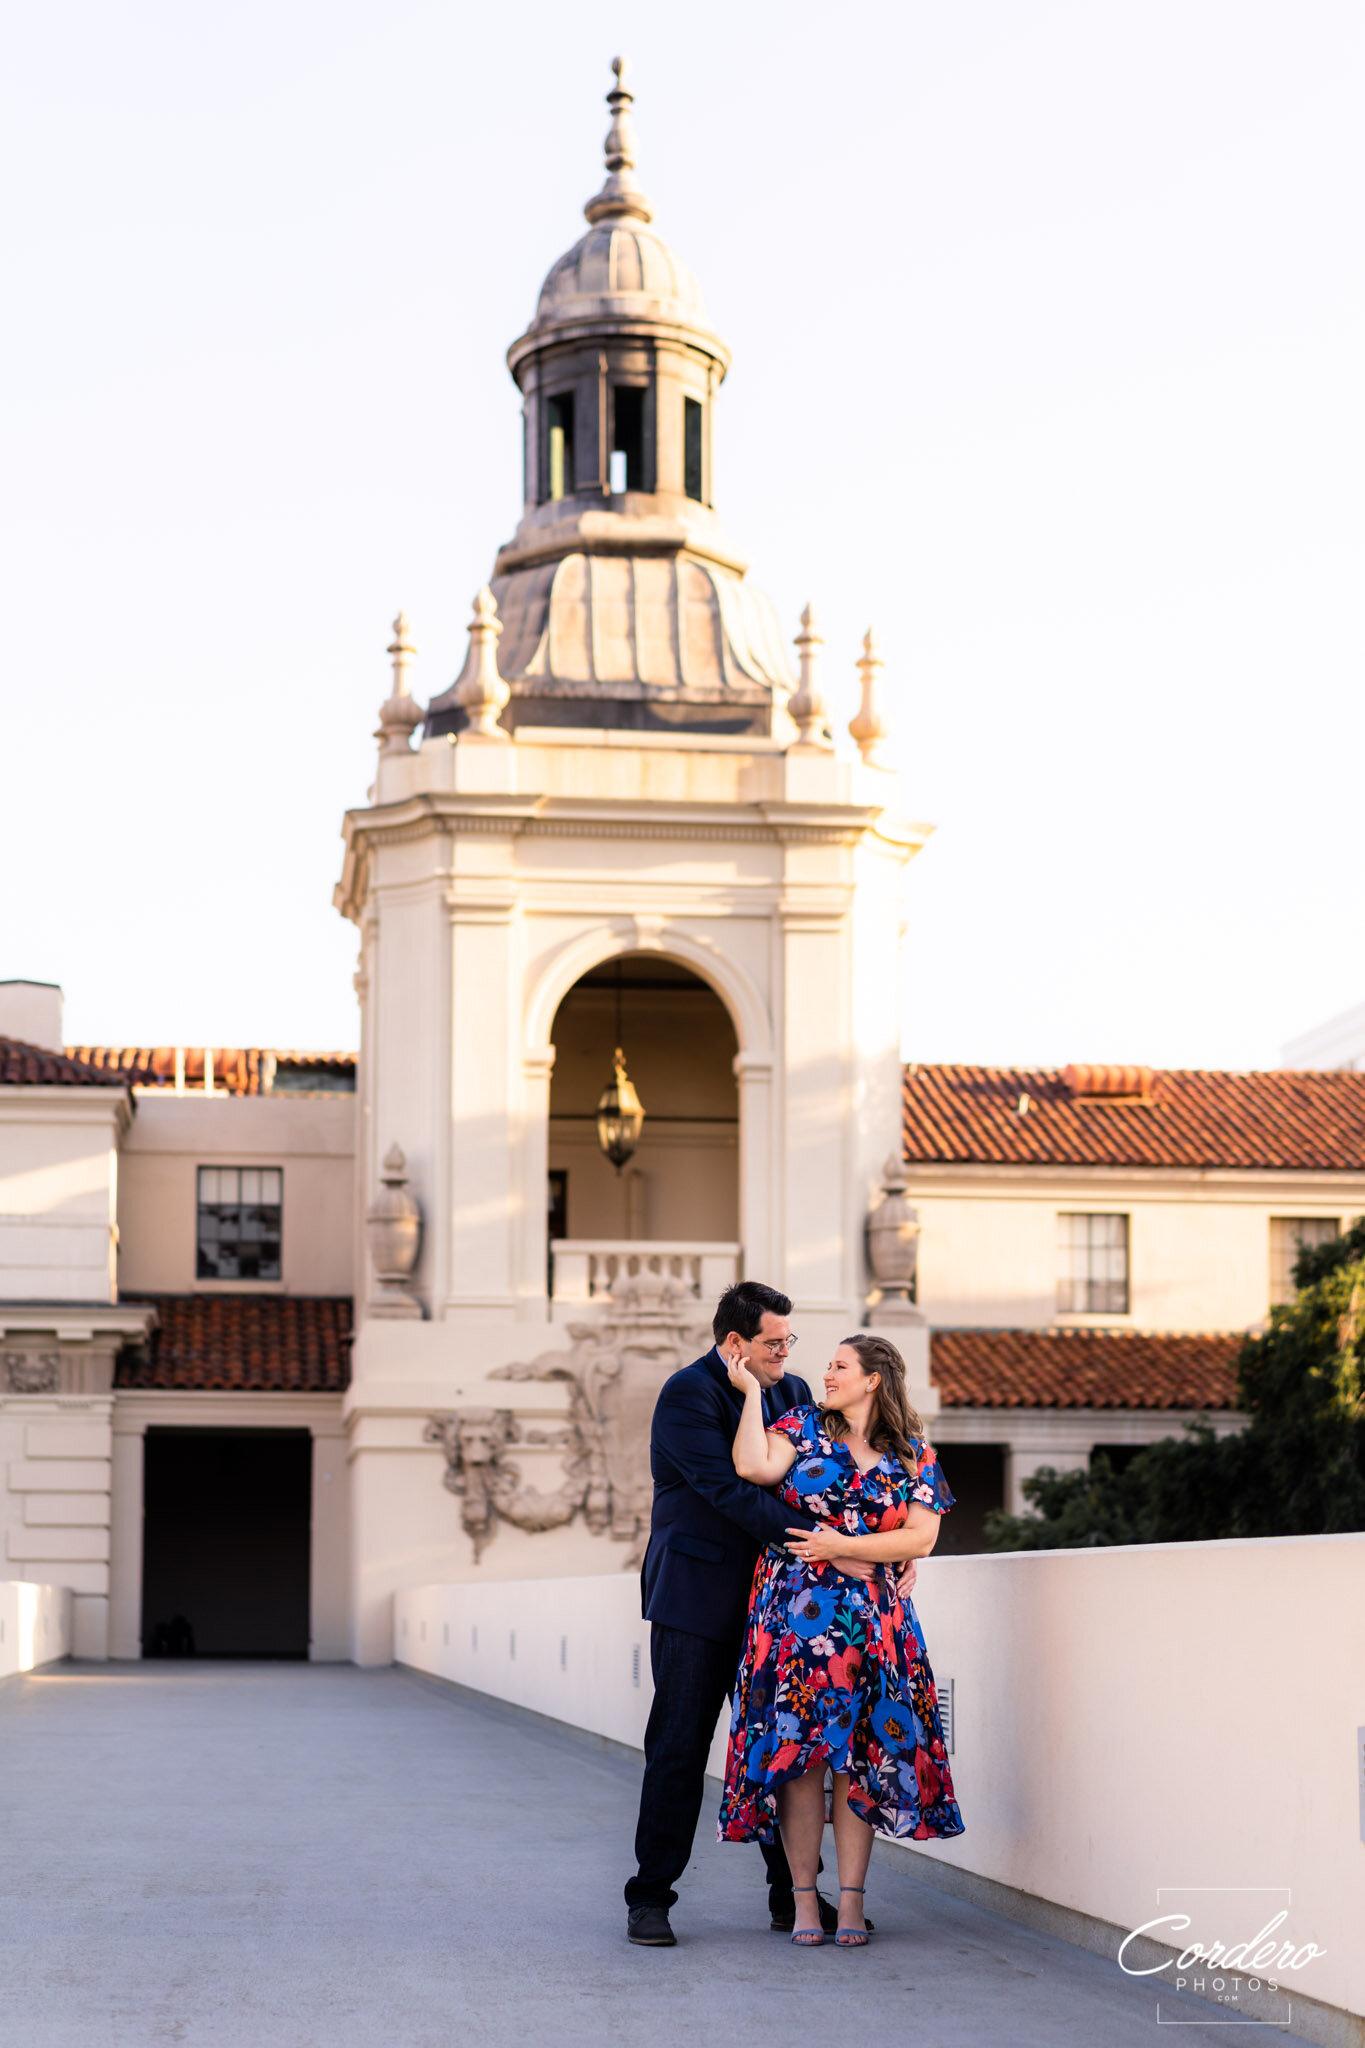 Hannah-and-Mitchell-Engagement-BLOG-06144.jpg